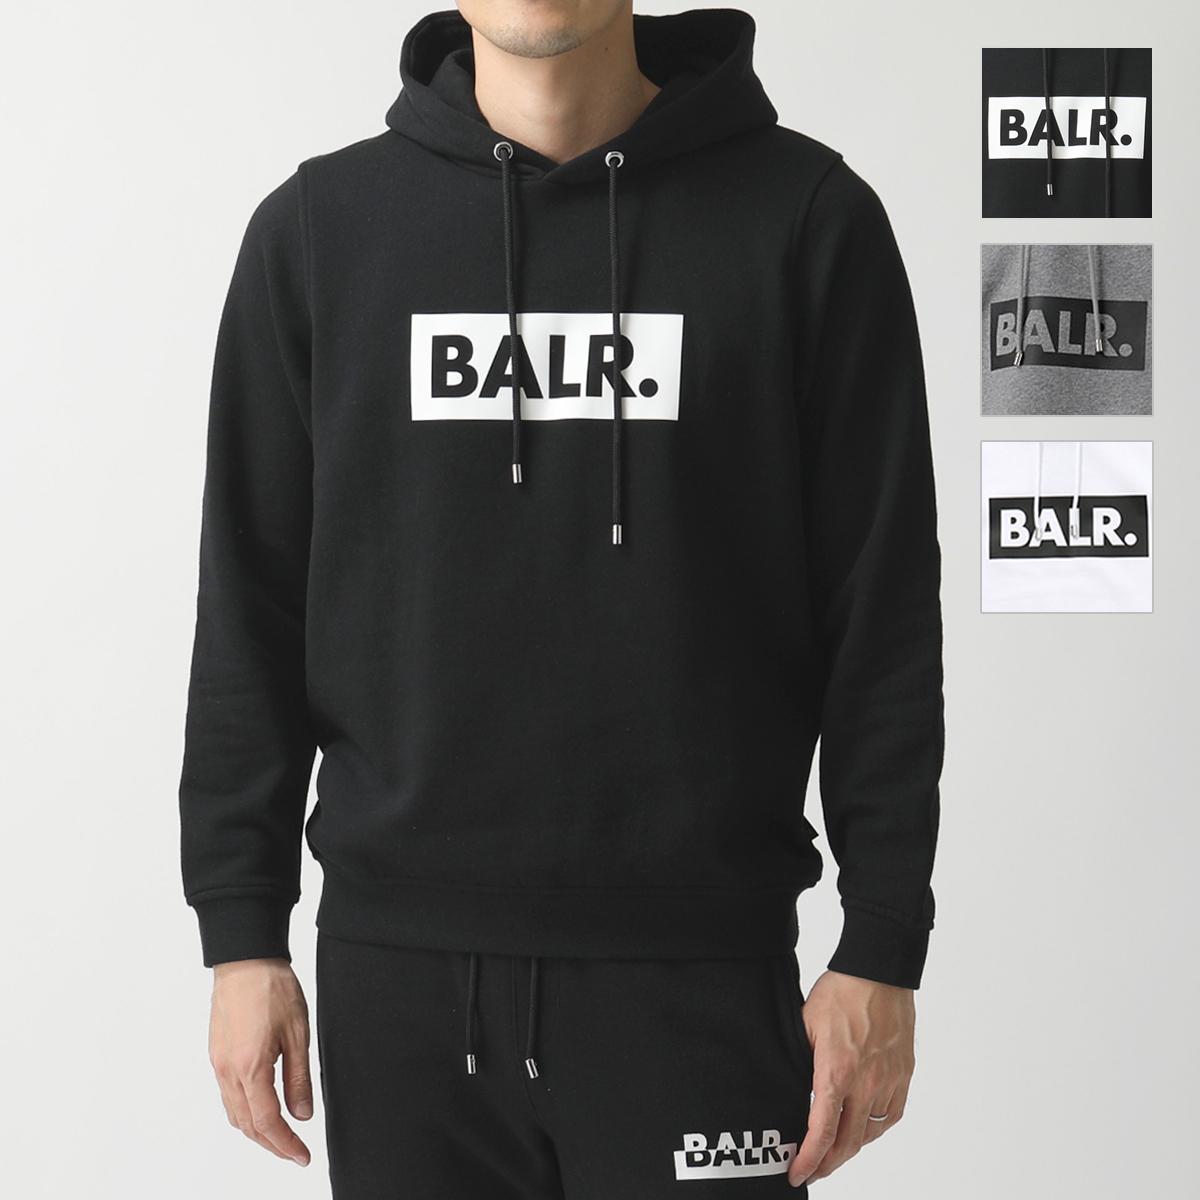 BALR. ボーラー Club Hoodie スウェット プルオーバー パーカー 裏起毛 BLACK/ブラック メンズ